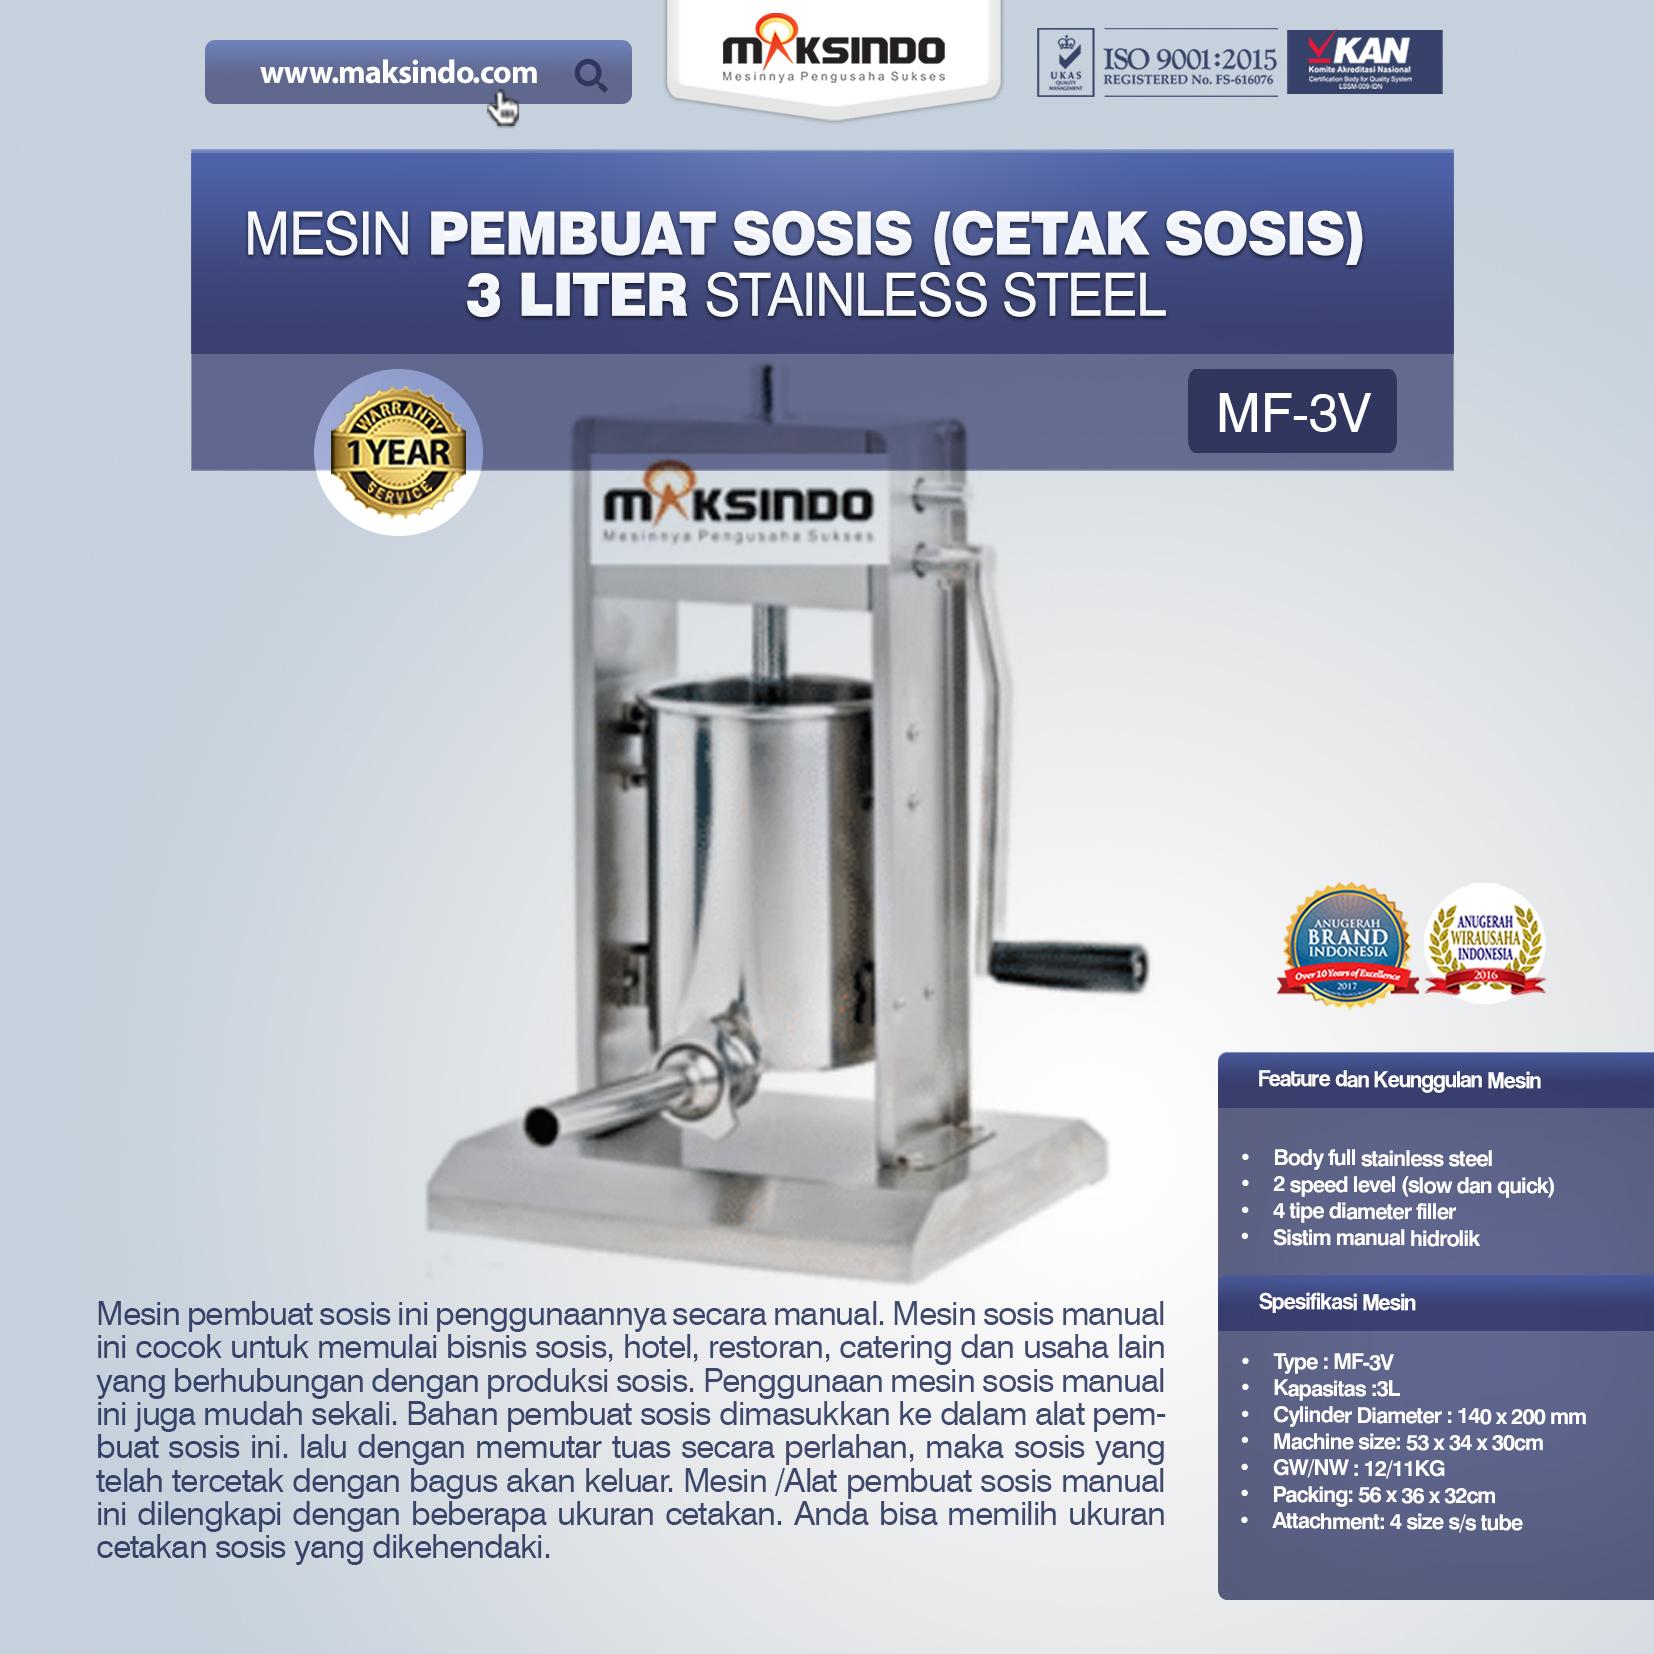 Mesin Pembuat Sosis (Cetak Sosis) Stainless Steel MF-3V